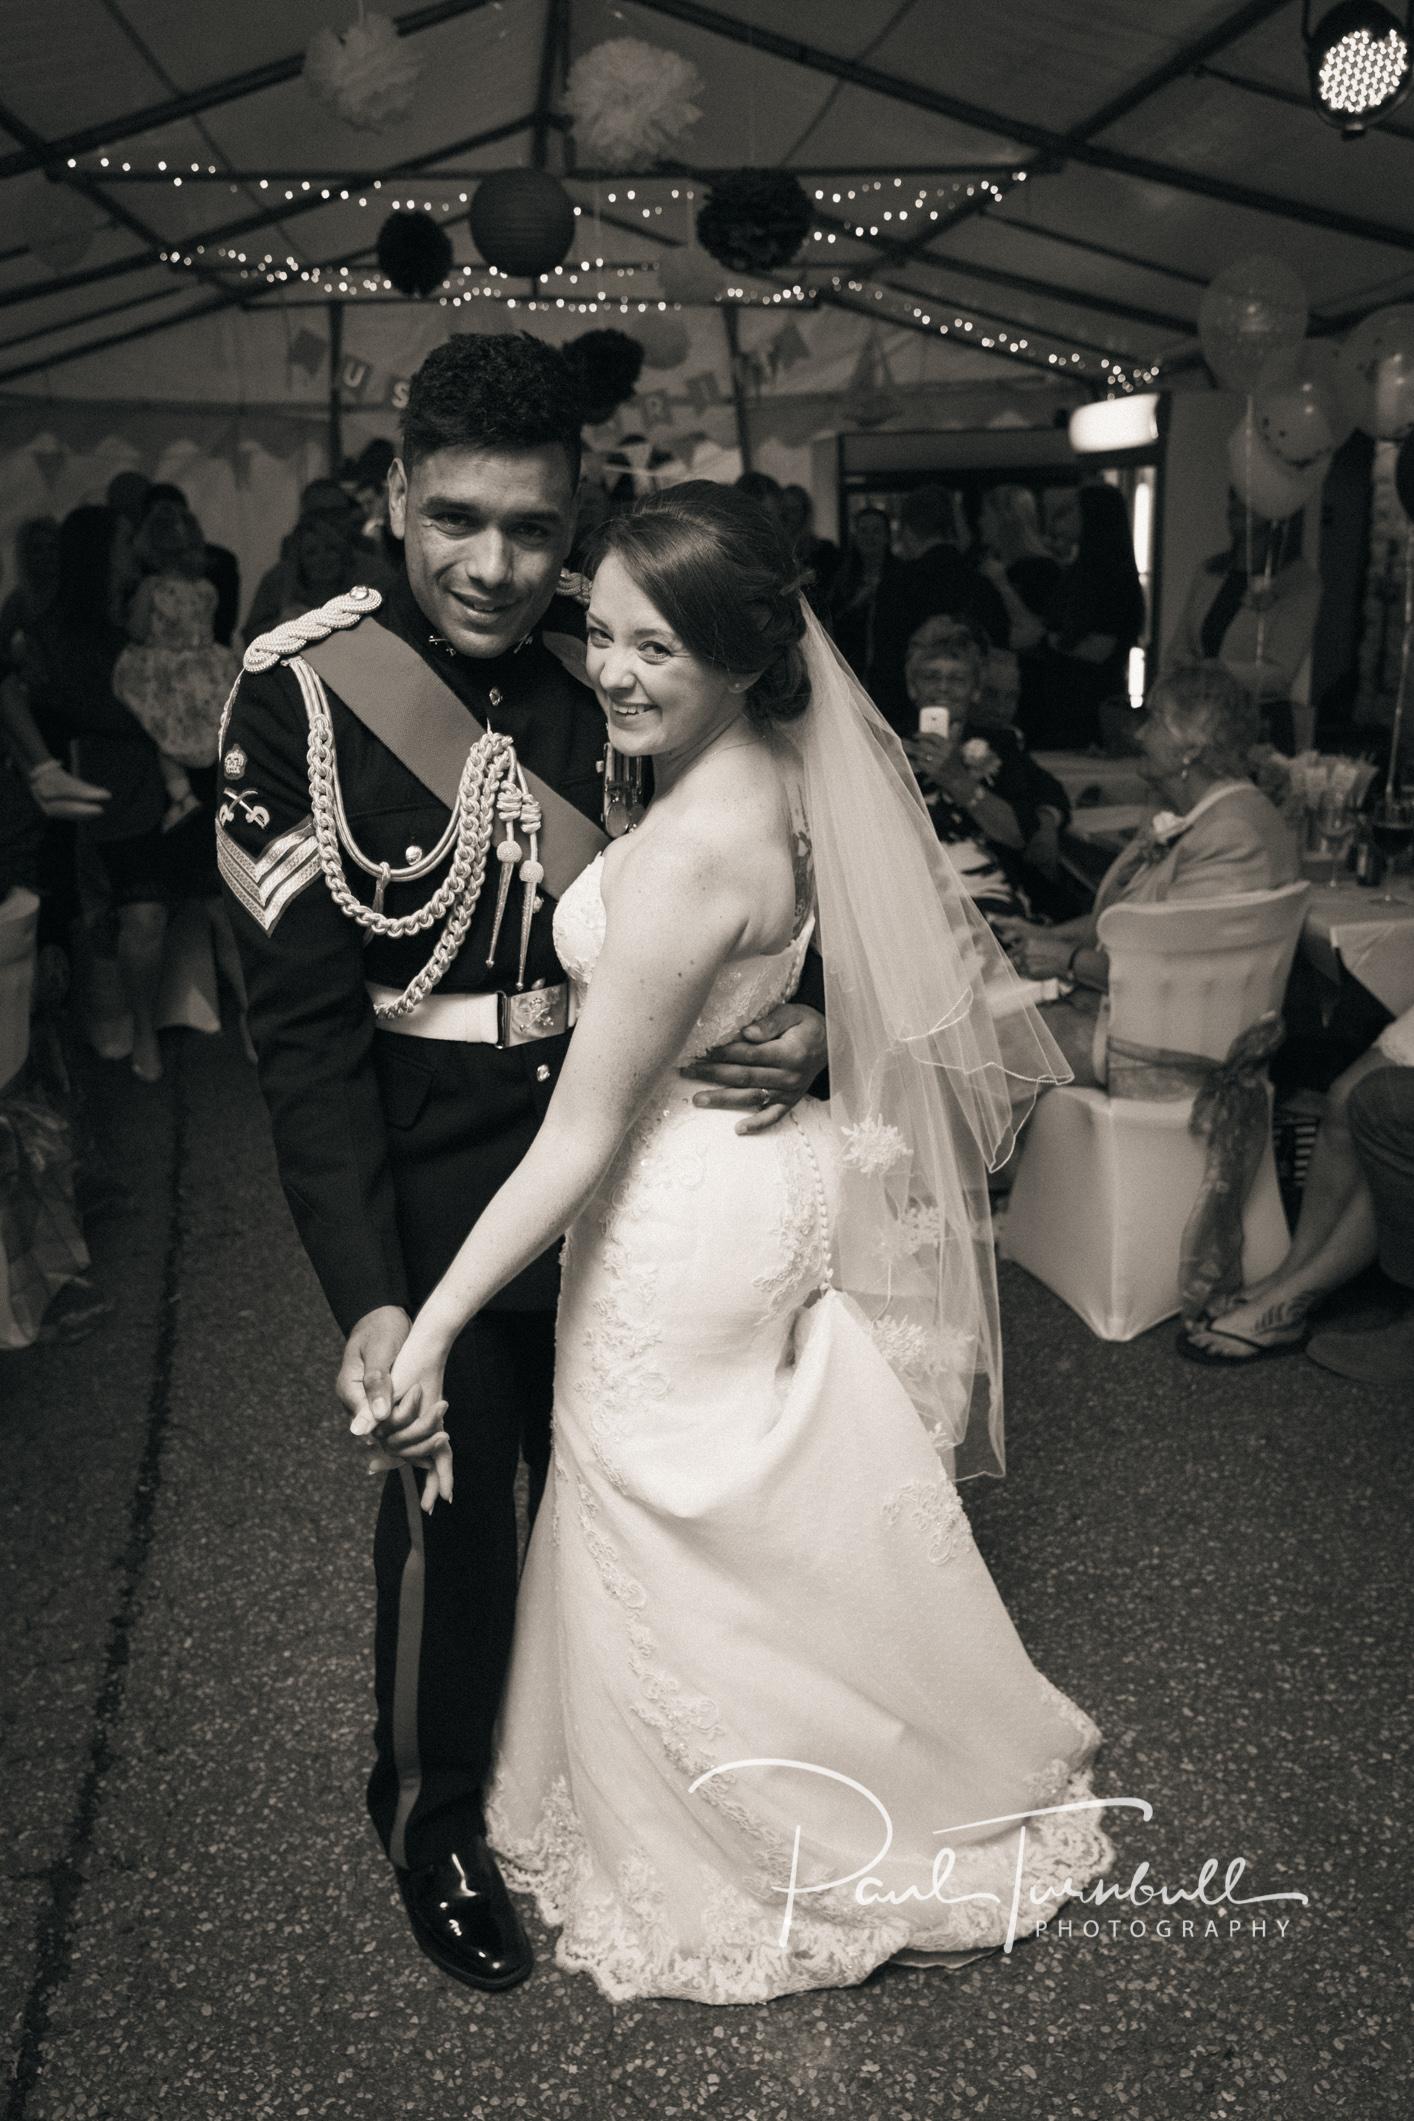 wedding-photographer-south-dalton-walkington-yorkshire-emma-james-081.jpg